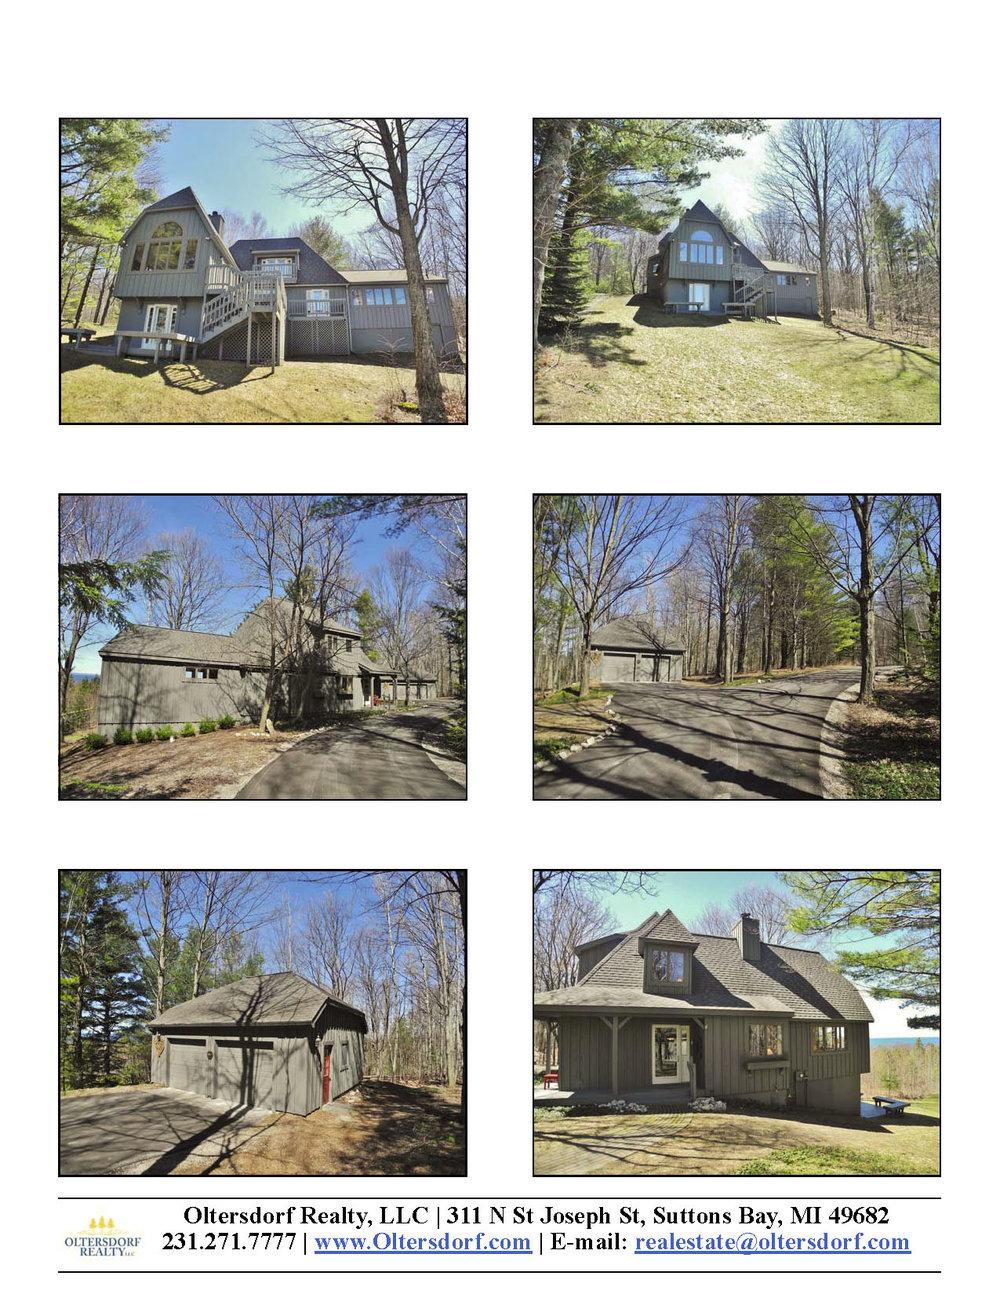 564 S Woodsmoke Drive, Lake Leelanau, MI – Sunset Lake Michigan Water Views - For Sale by Oltersdorf Realty - Marketing Packet (3).jpg